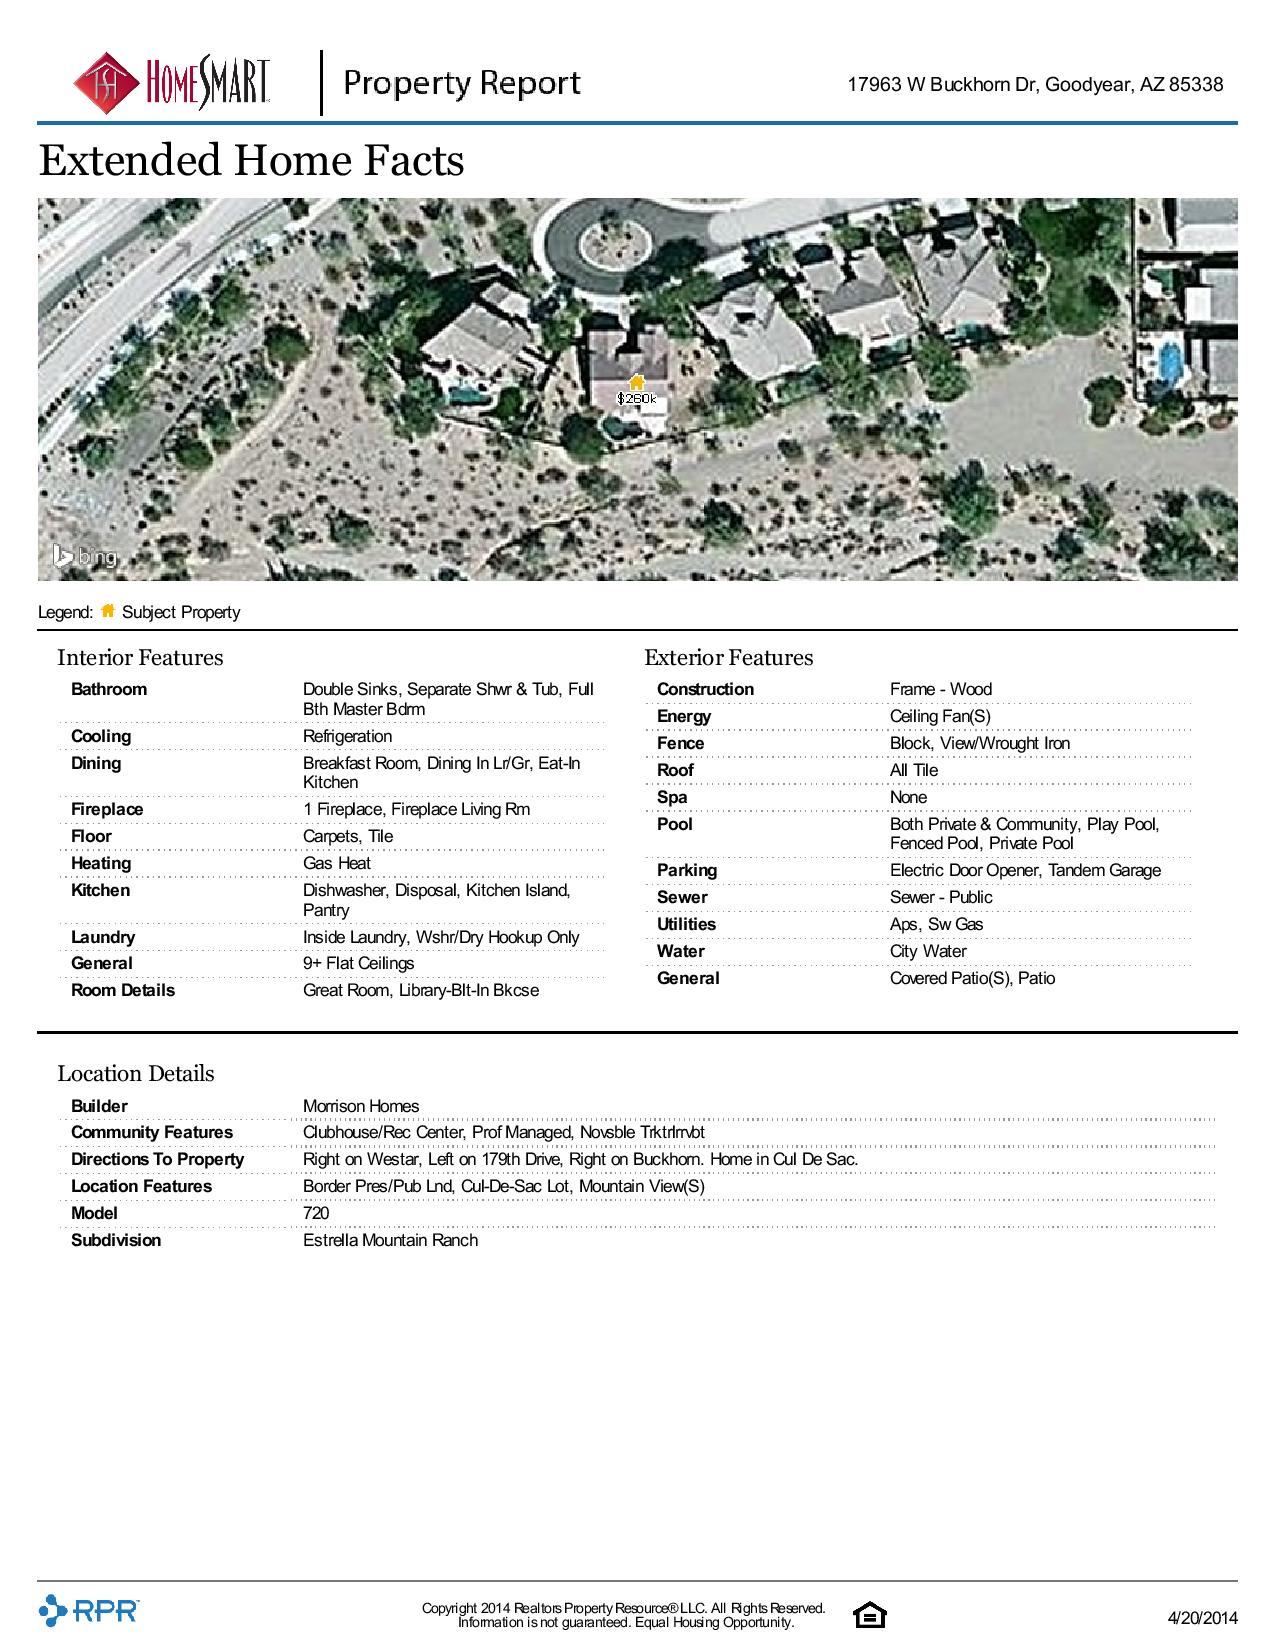 17963-W-Buckhorn-Dr-Goodyear-AZ-85338-page-004